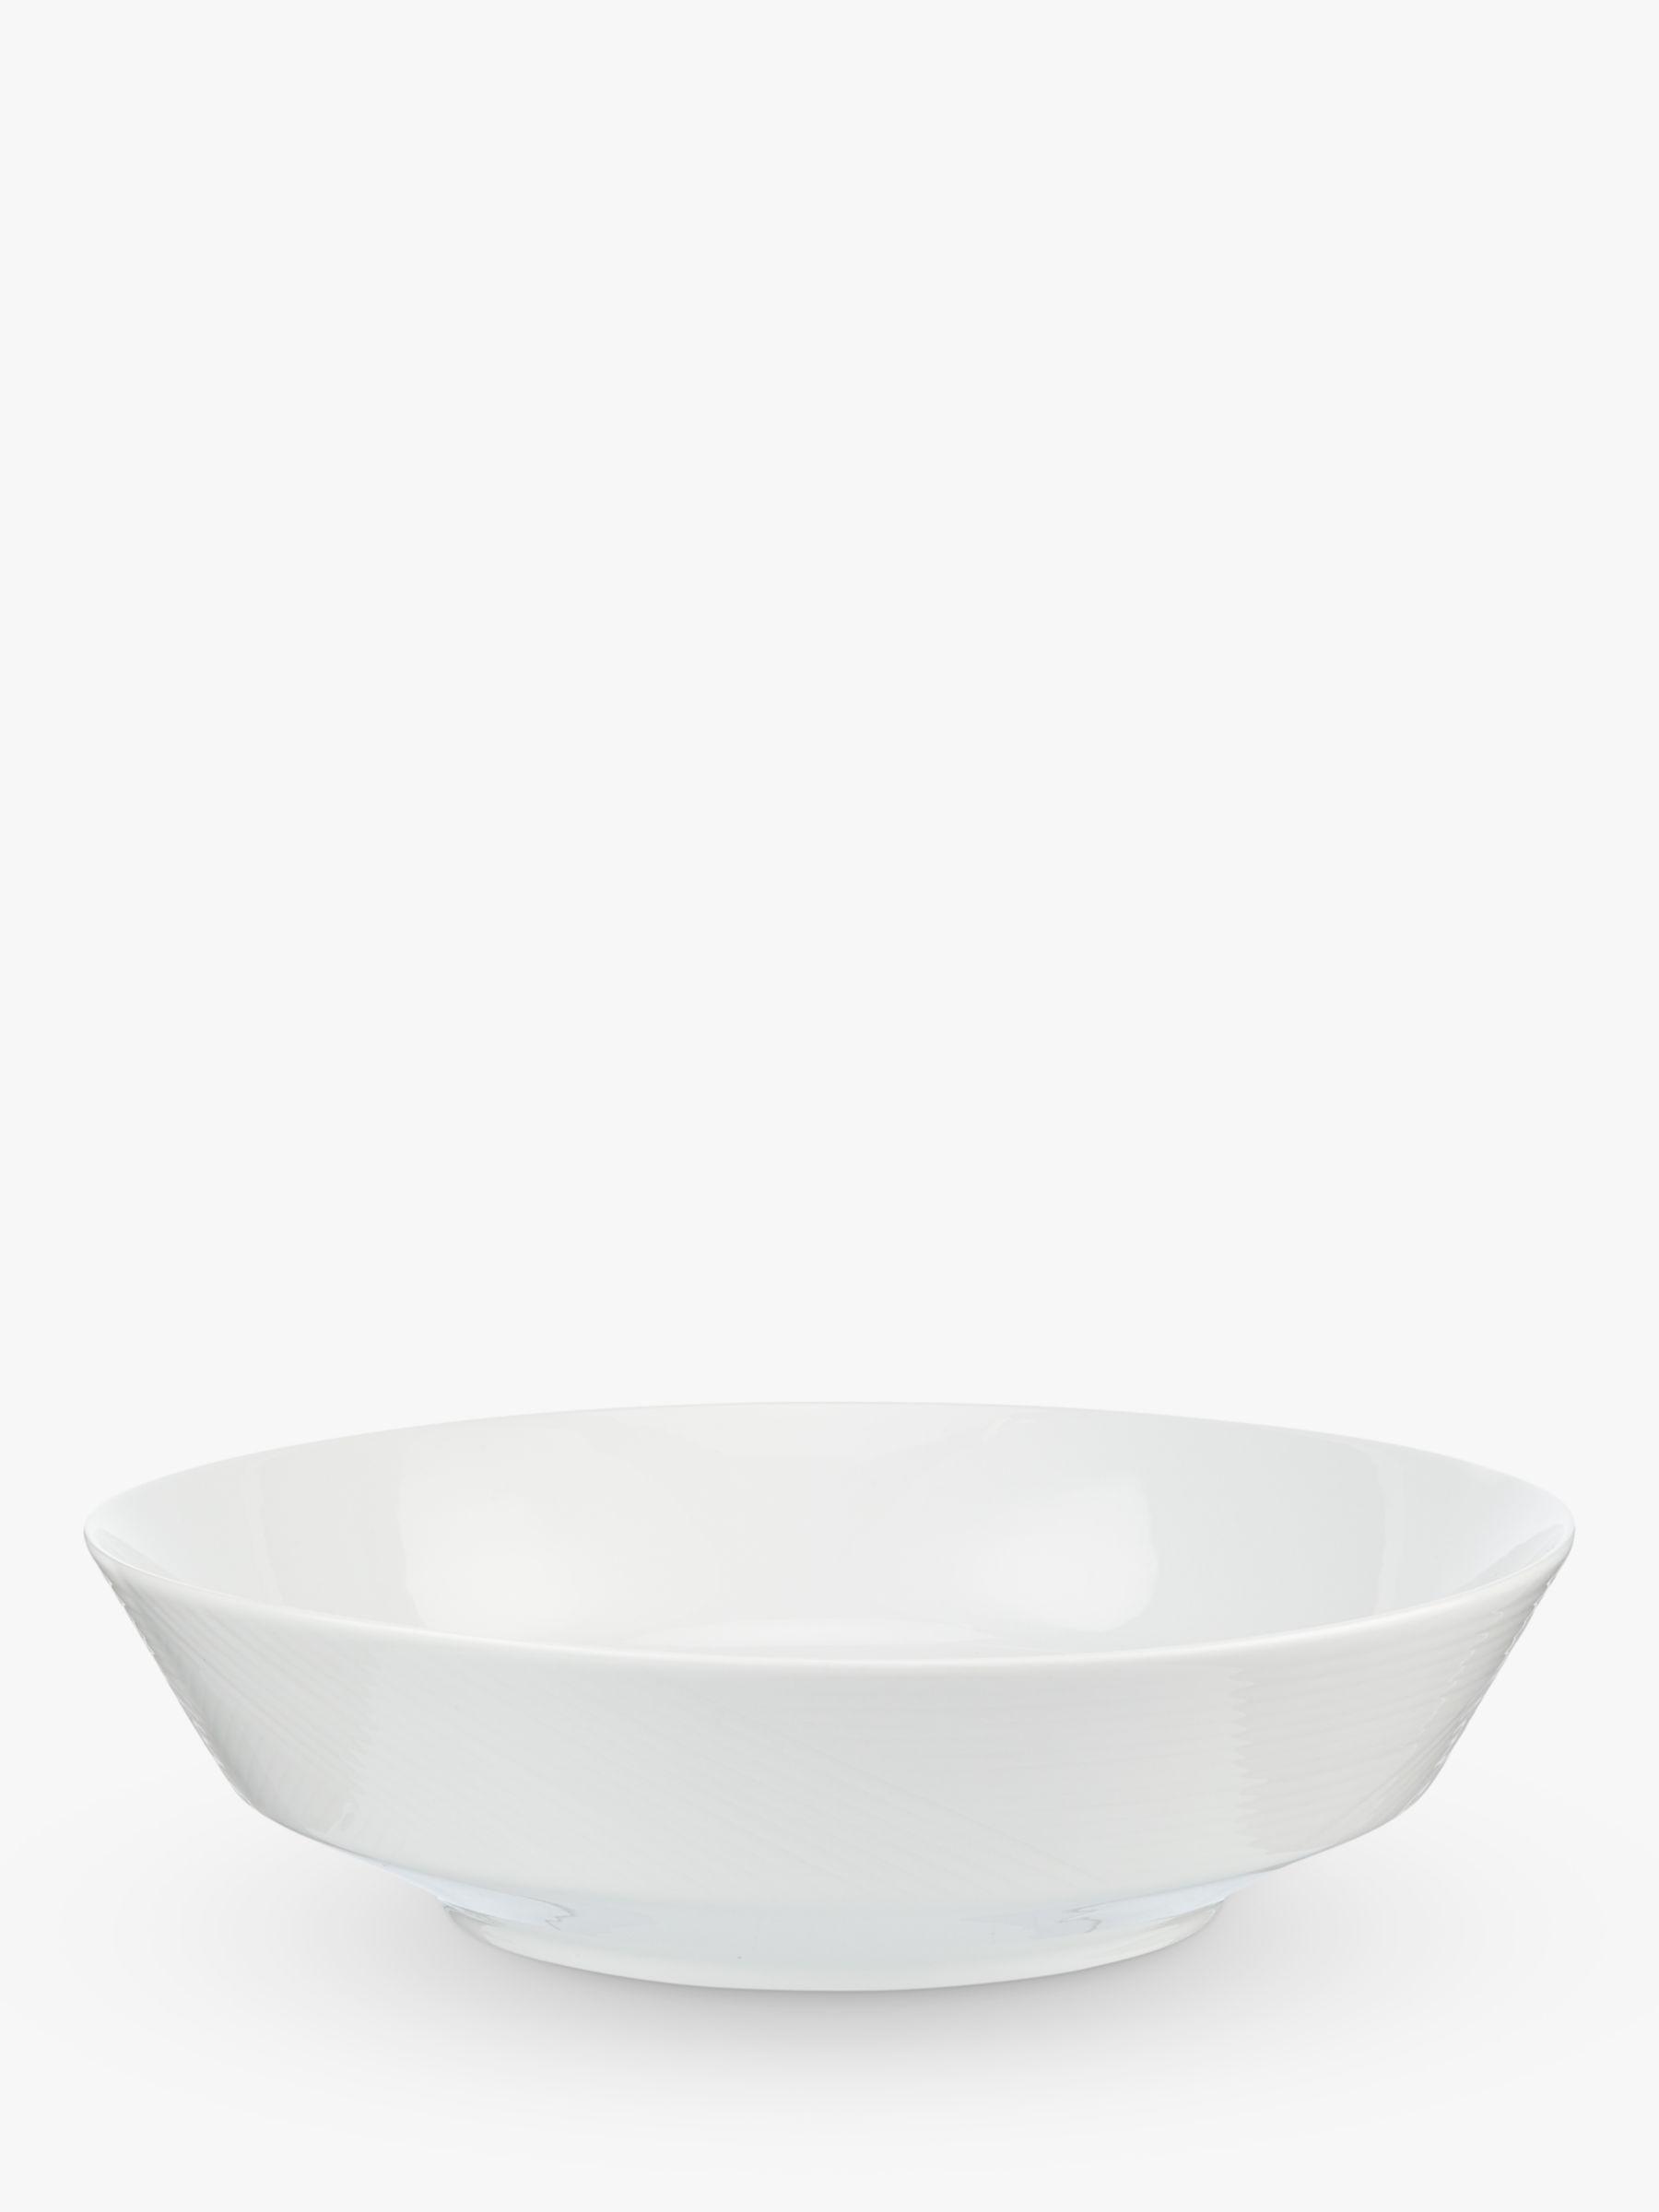 Design Project by John Lewis Design Project by John Lewis No.098 30cm Serve Bowl